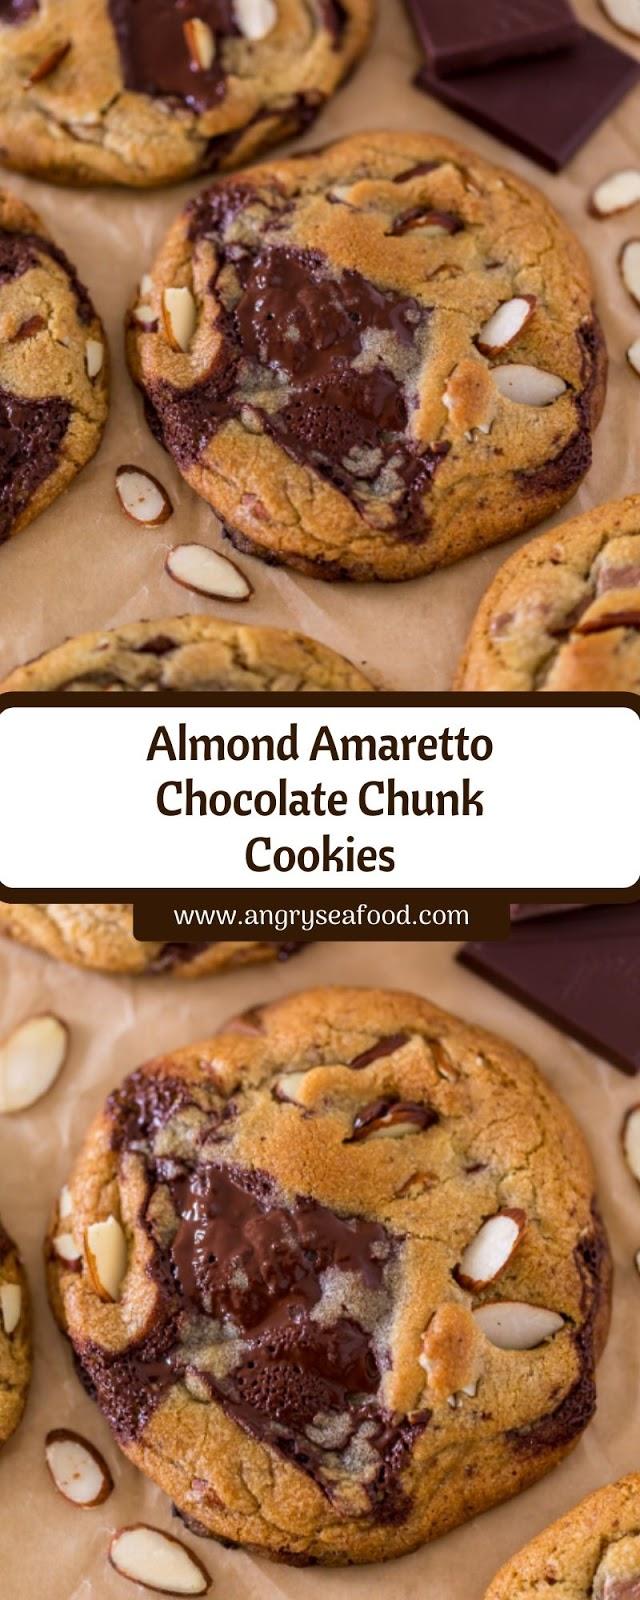 Almond Amaretto Chocolate Chunk Cookies